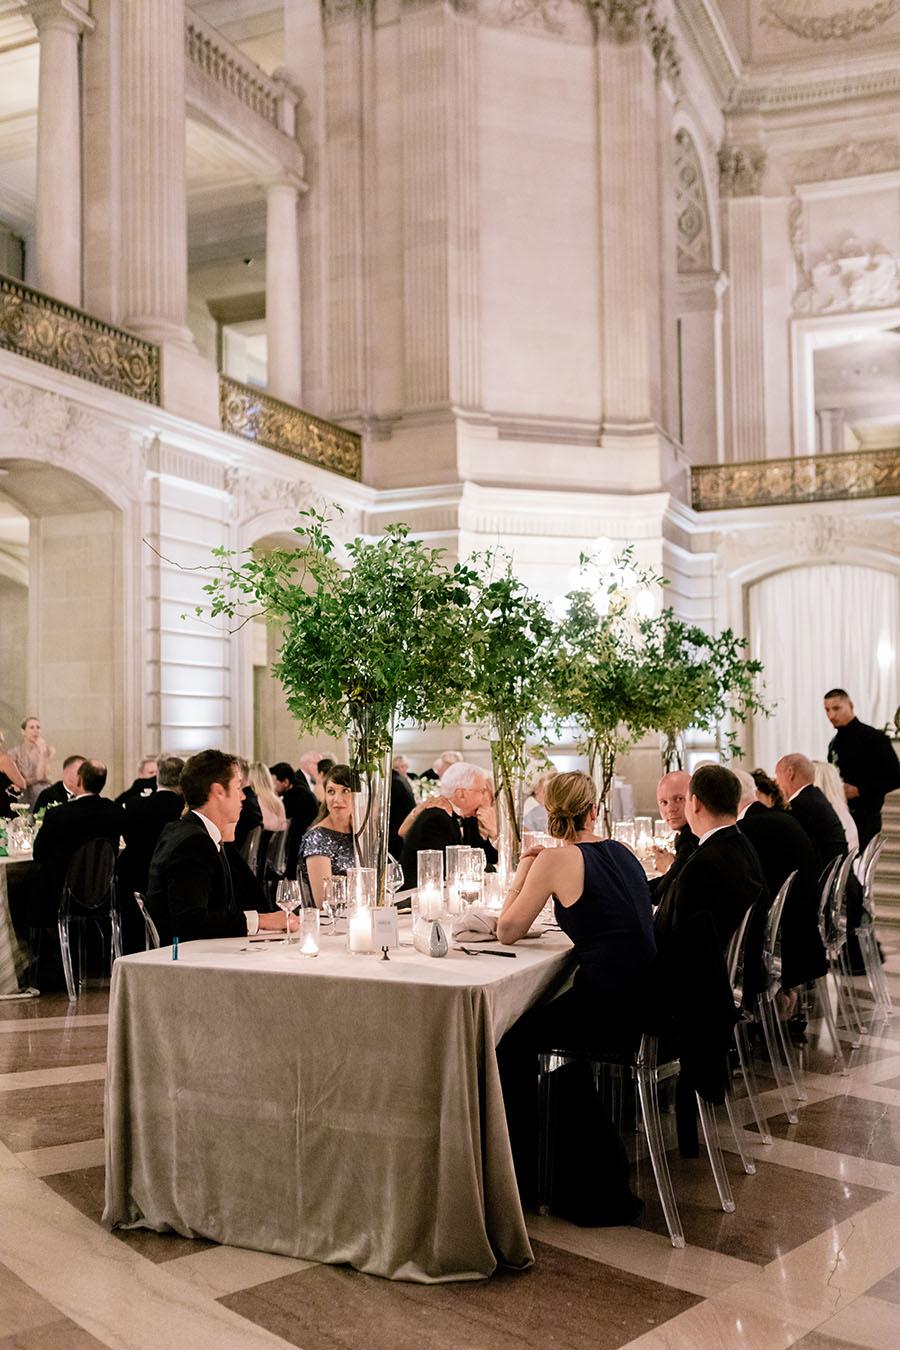 San Francisco City Hall wedding Nicole Blumberg Photography (646 of 842).jpg